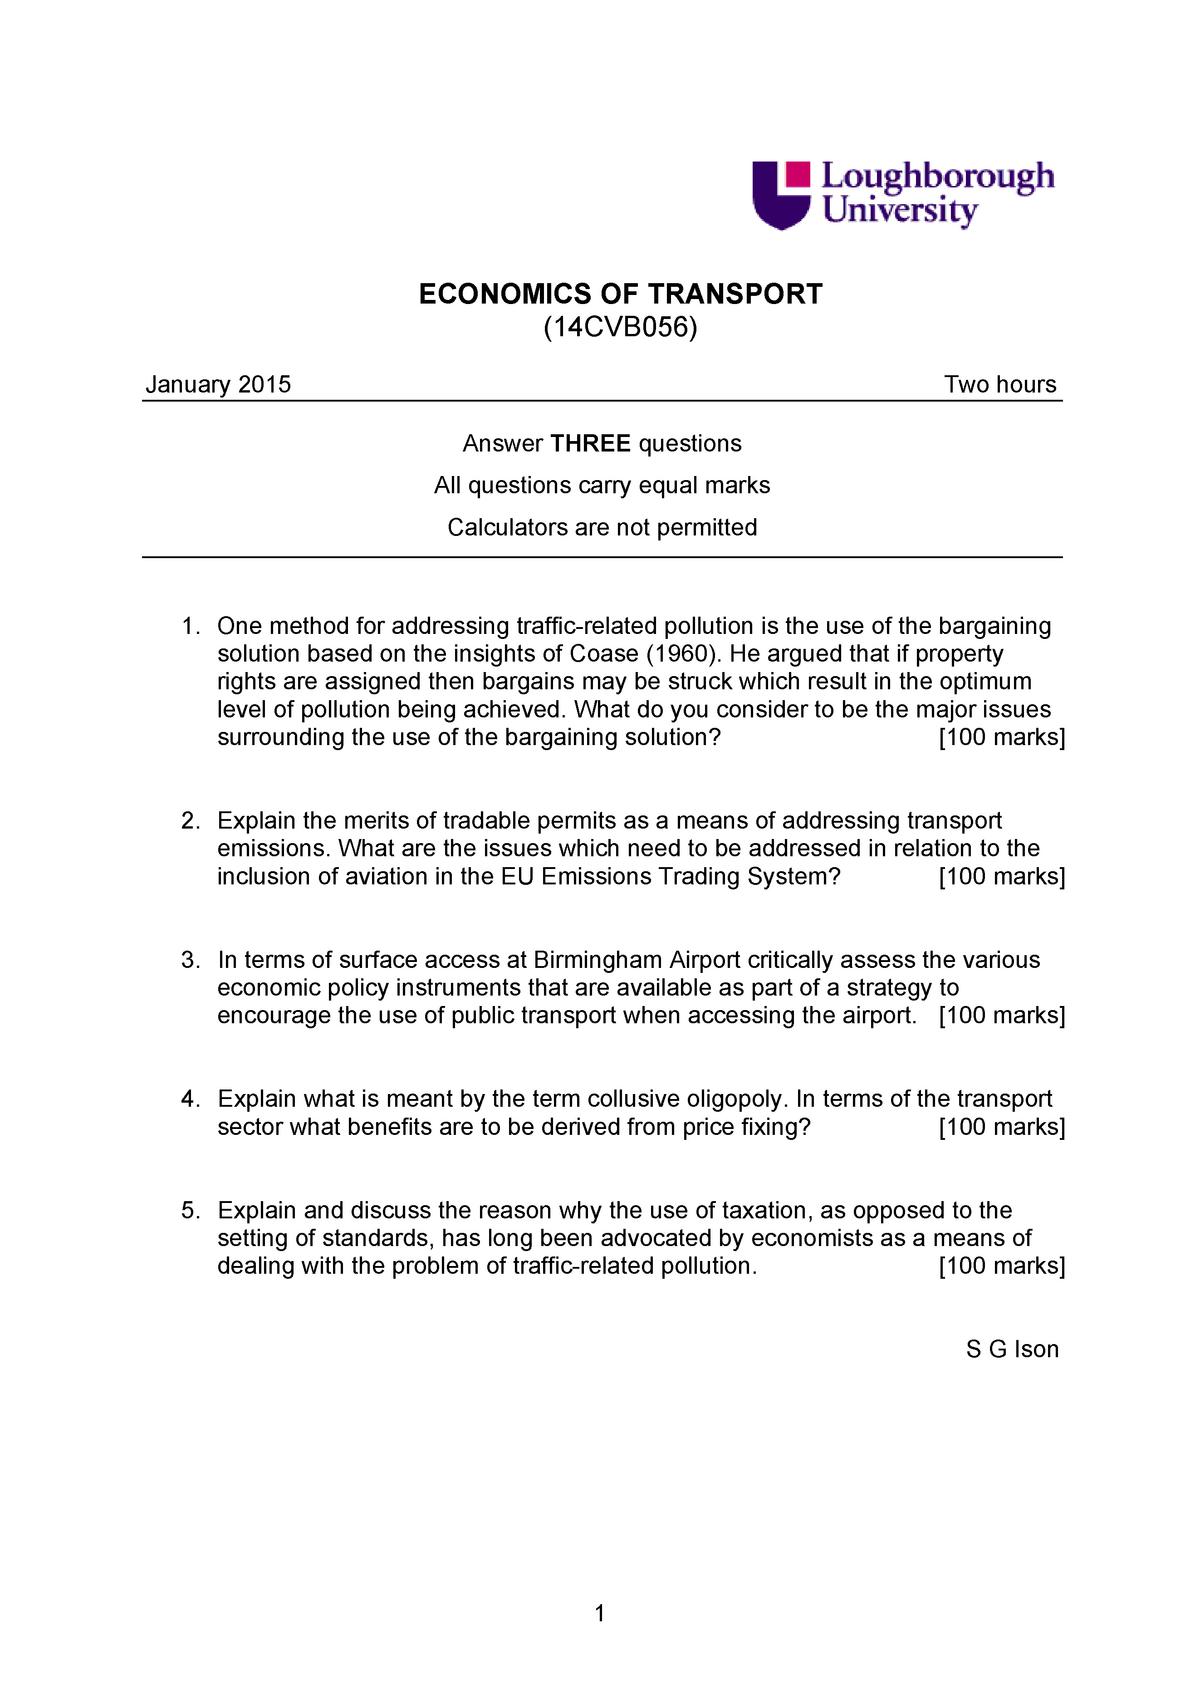 Exam 2015 - 17CVB056: Economics of Transport - StuDocu